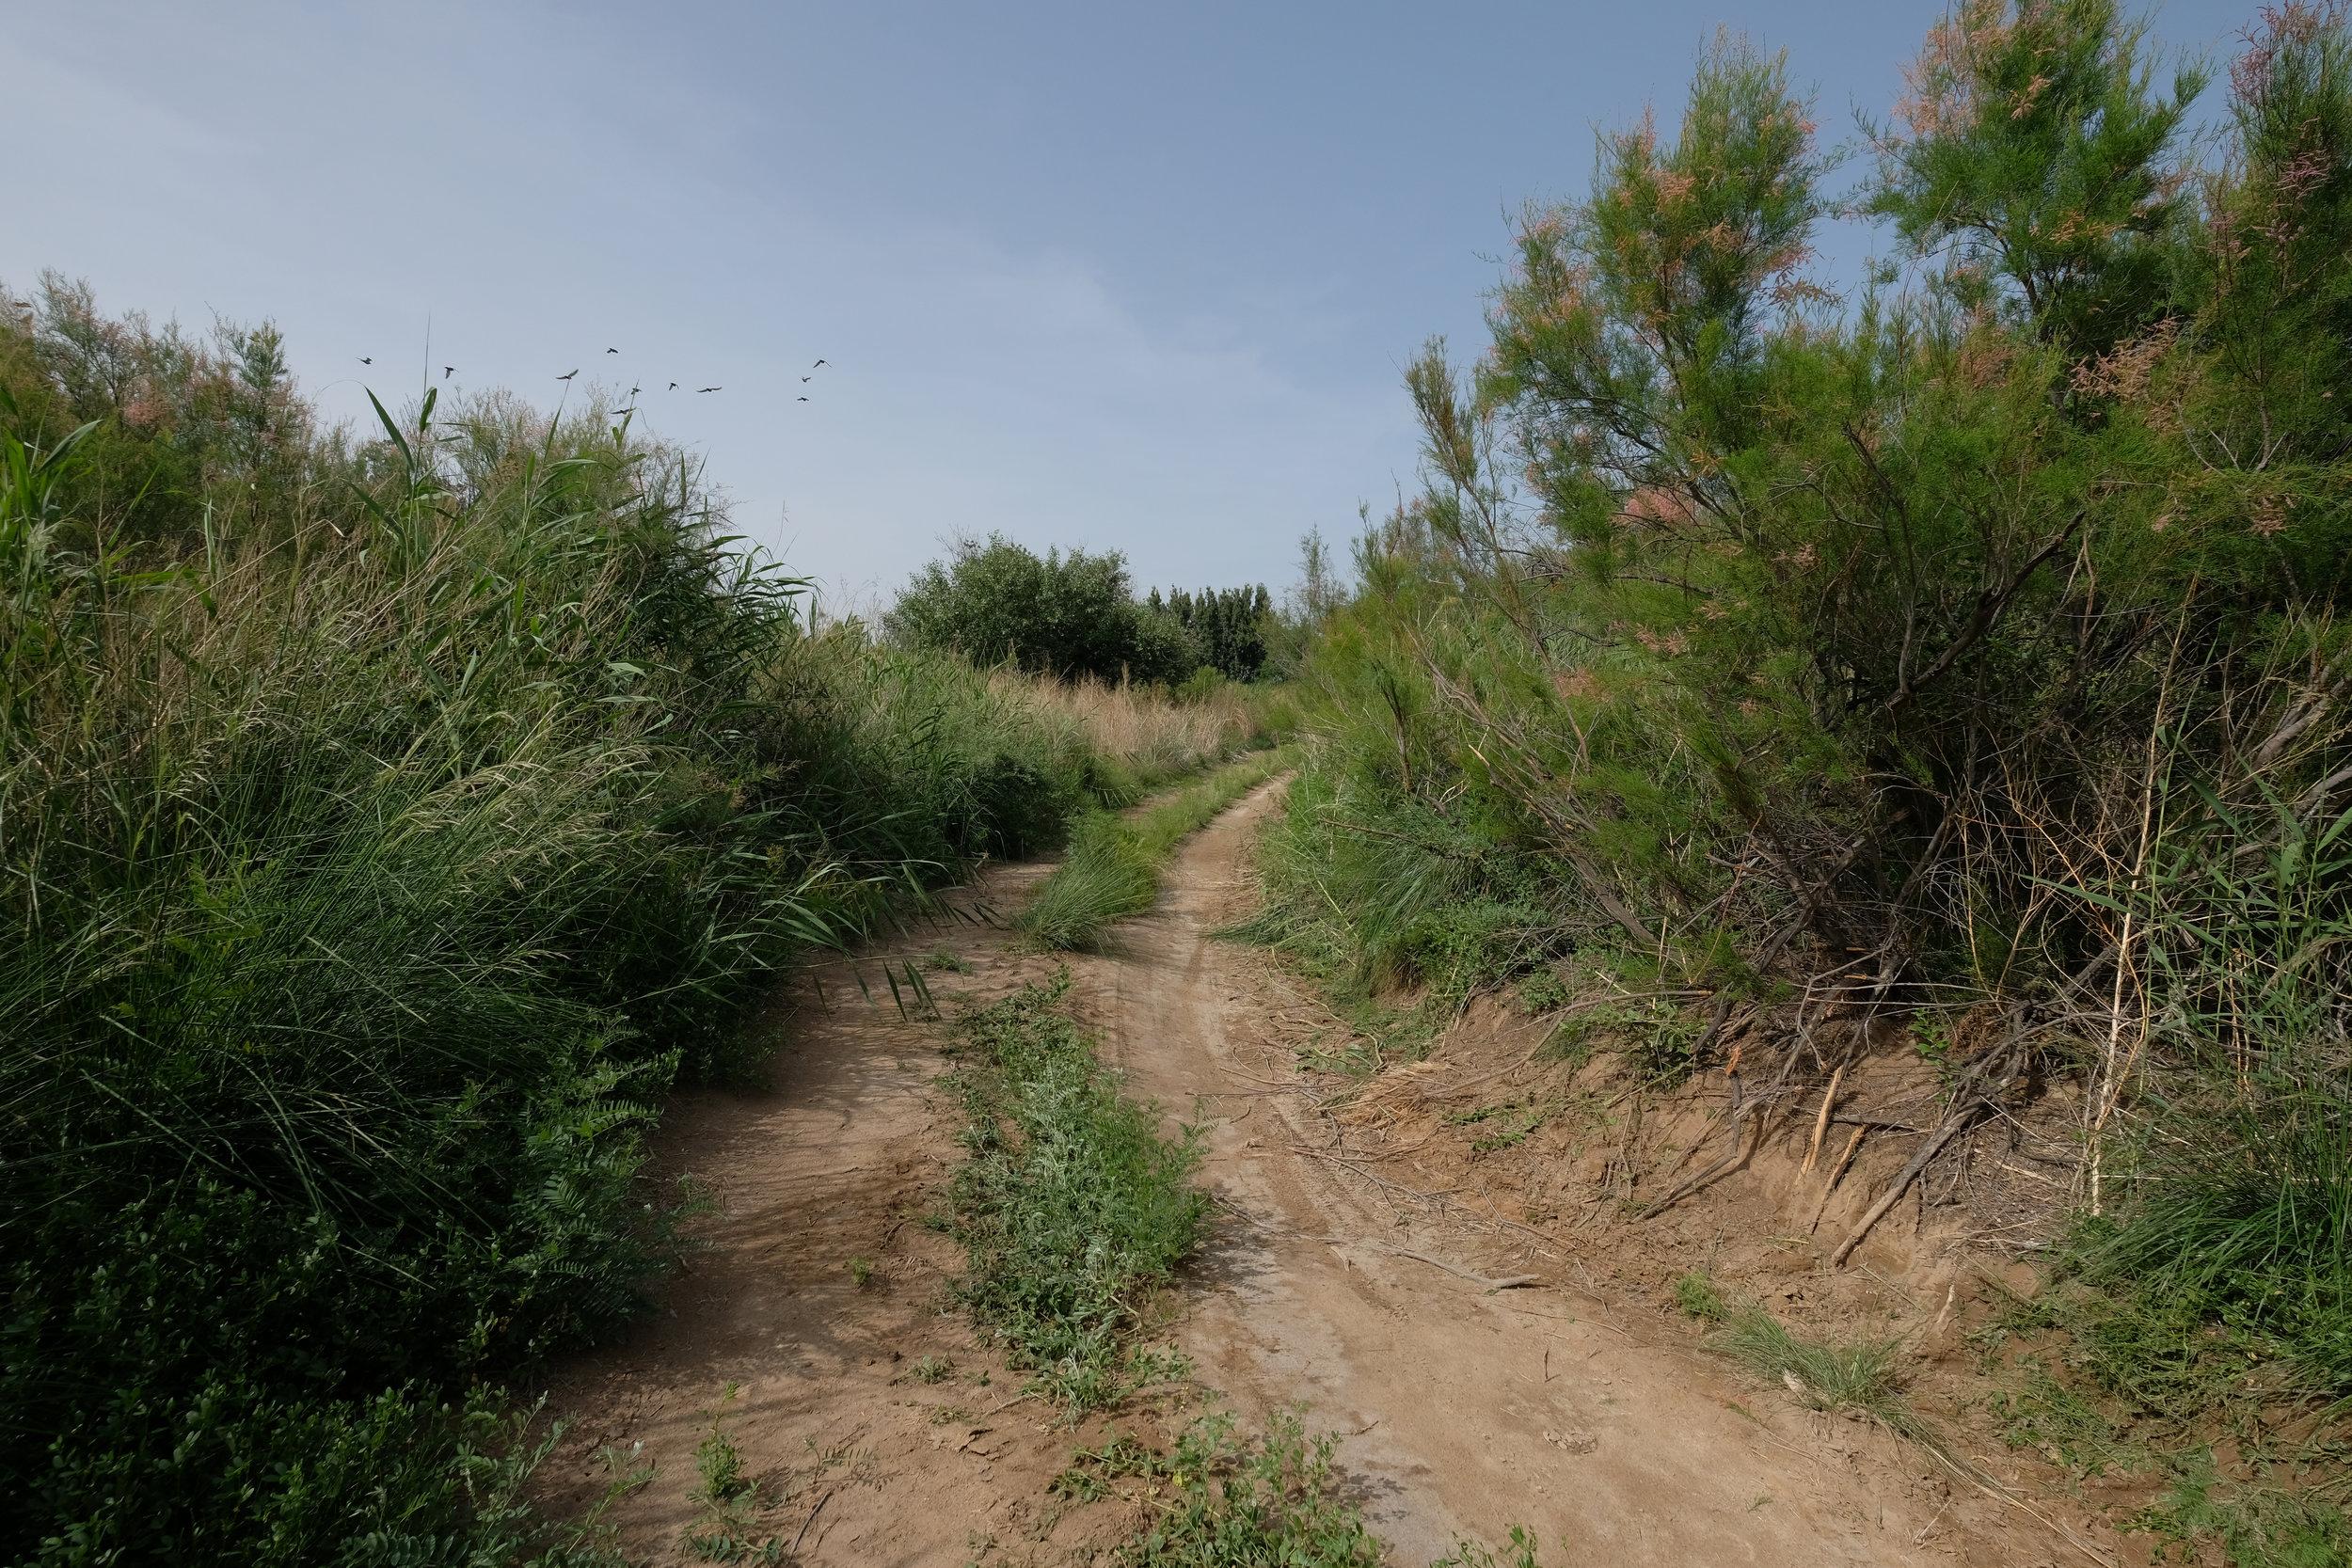 kazakh-corner-route-4670_34637836134_o.jpg